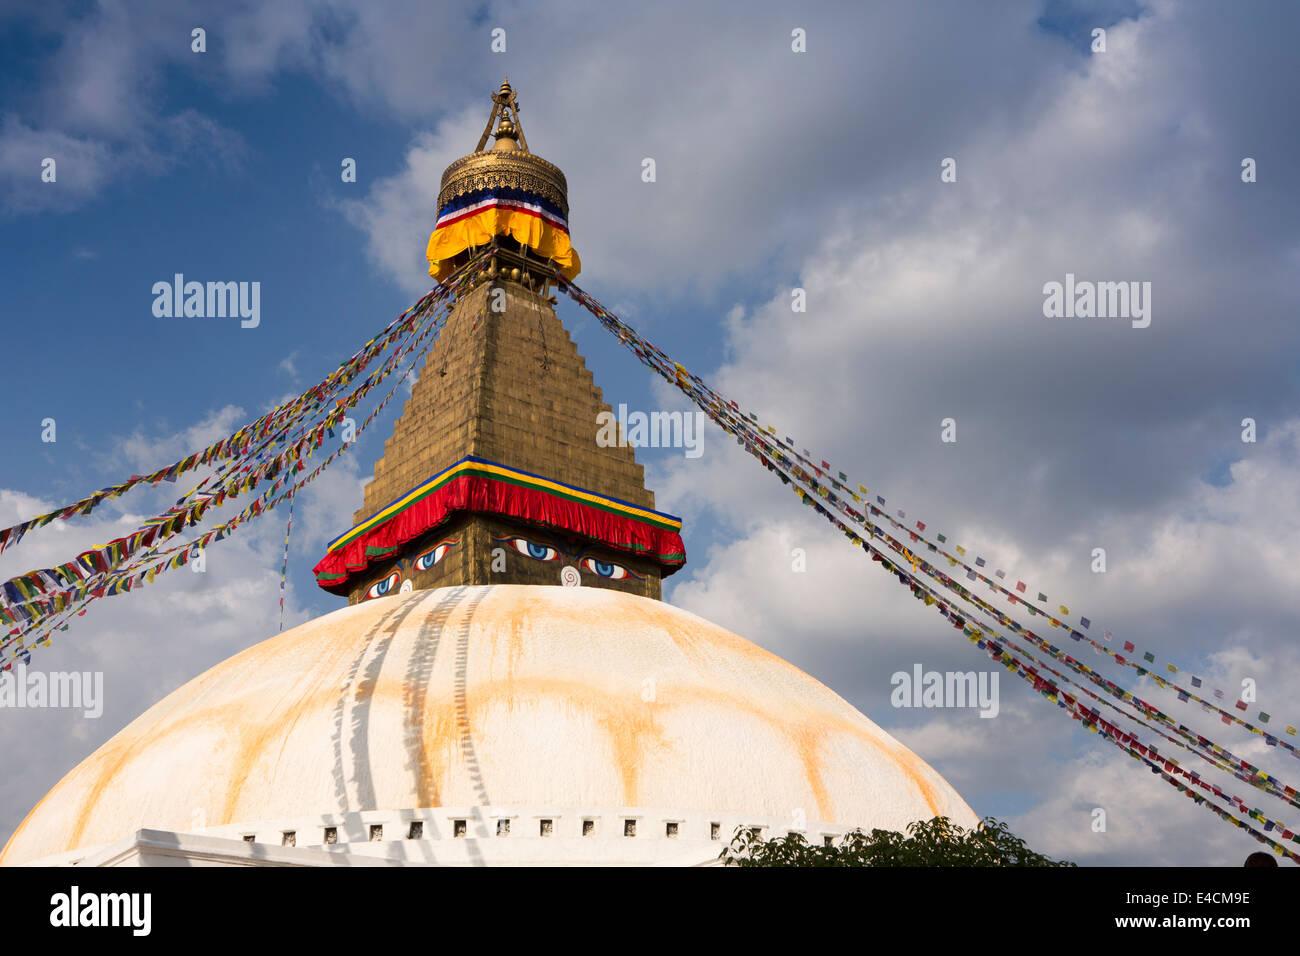 Nepal, Kathmandu, Boudhanath, stupa dome and all seeing Buddha eyes - Stock Image